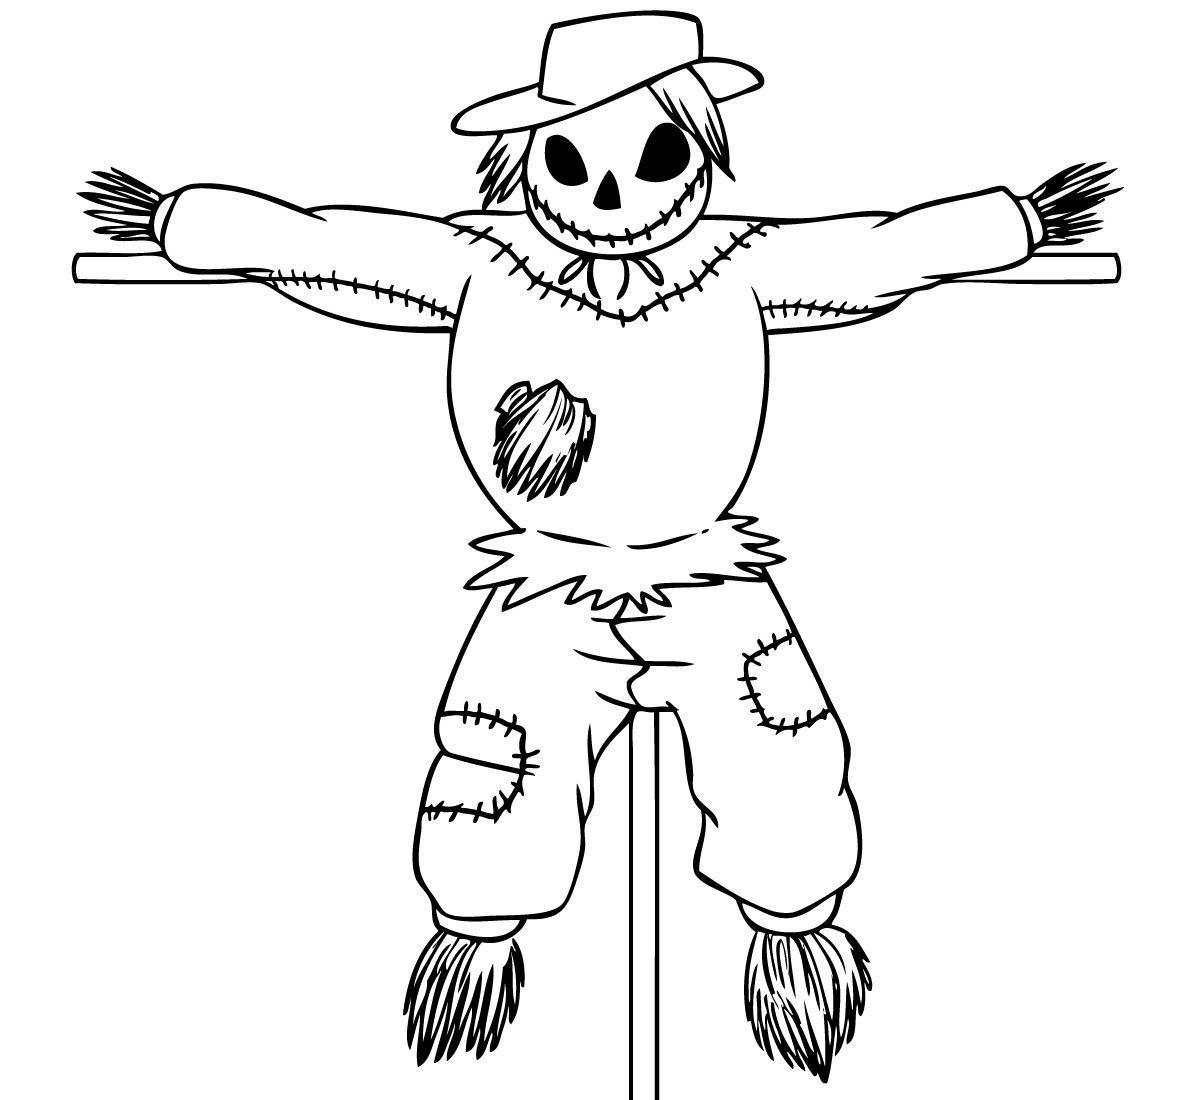 scarecrow coloring sheet free printable scarecrow coloring pages for kids coloring sheet scarecrow